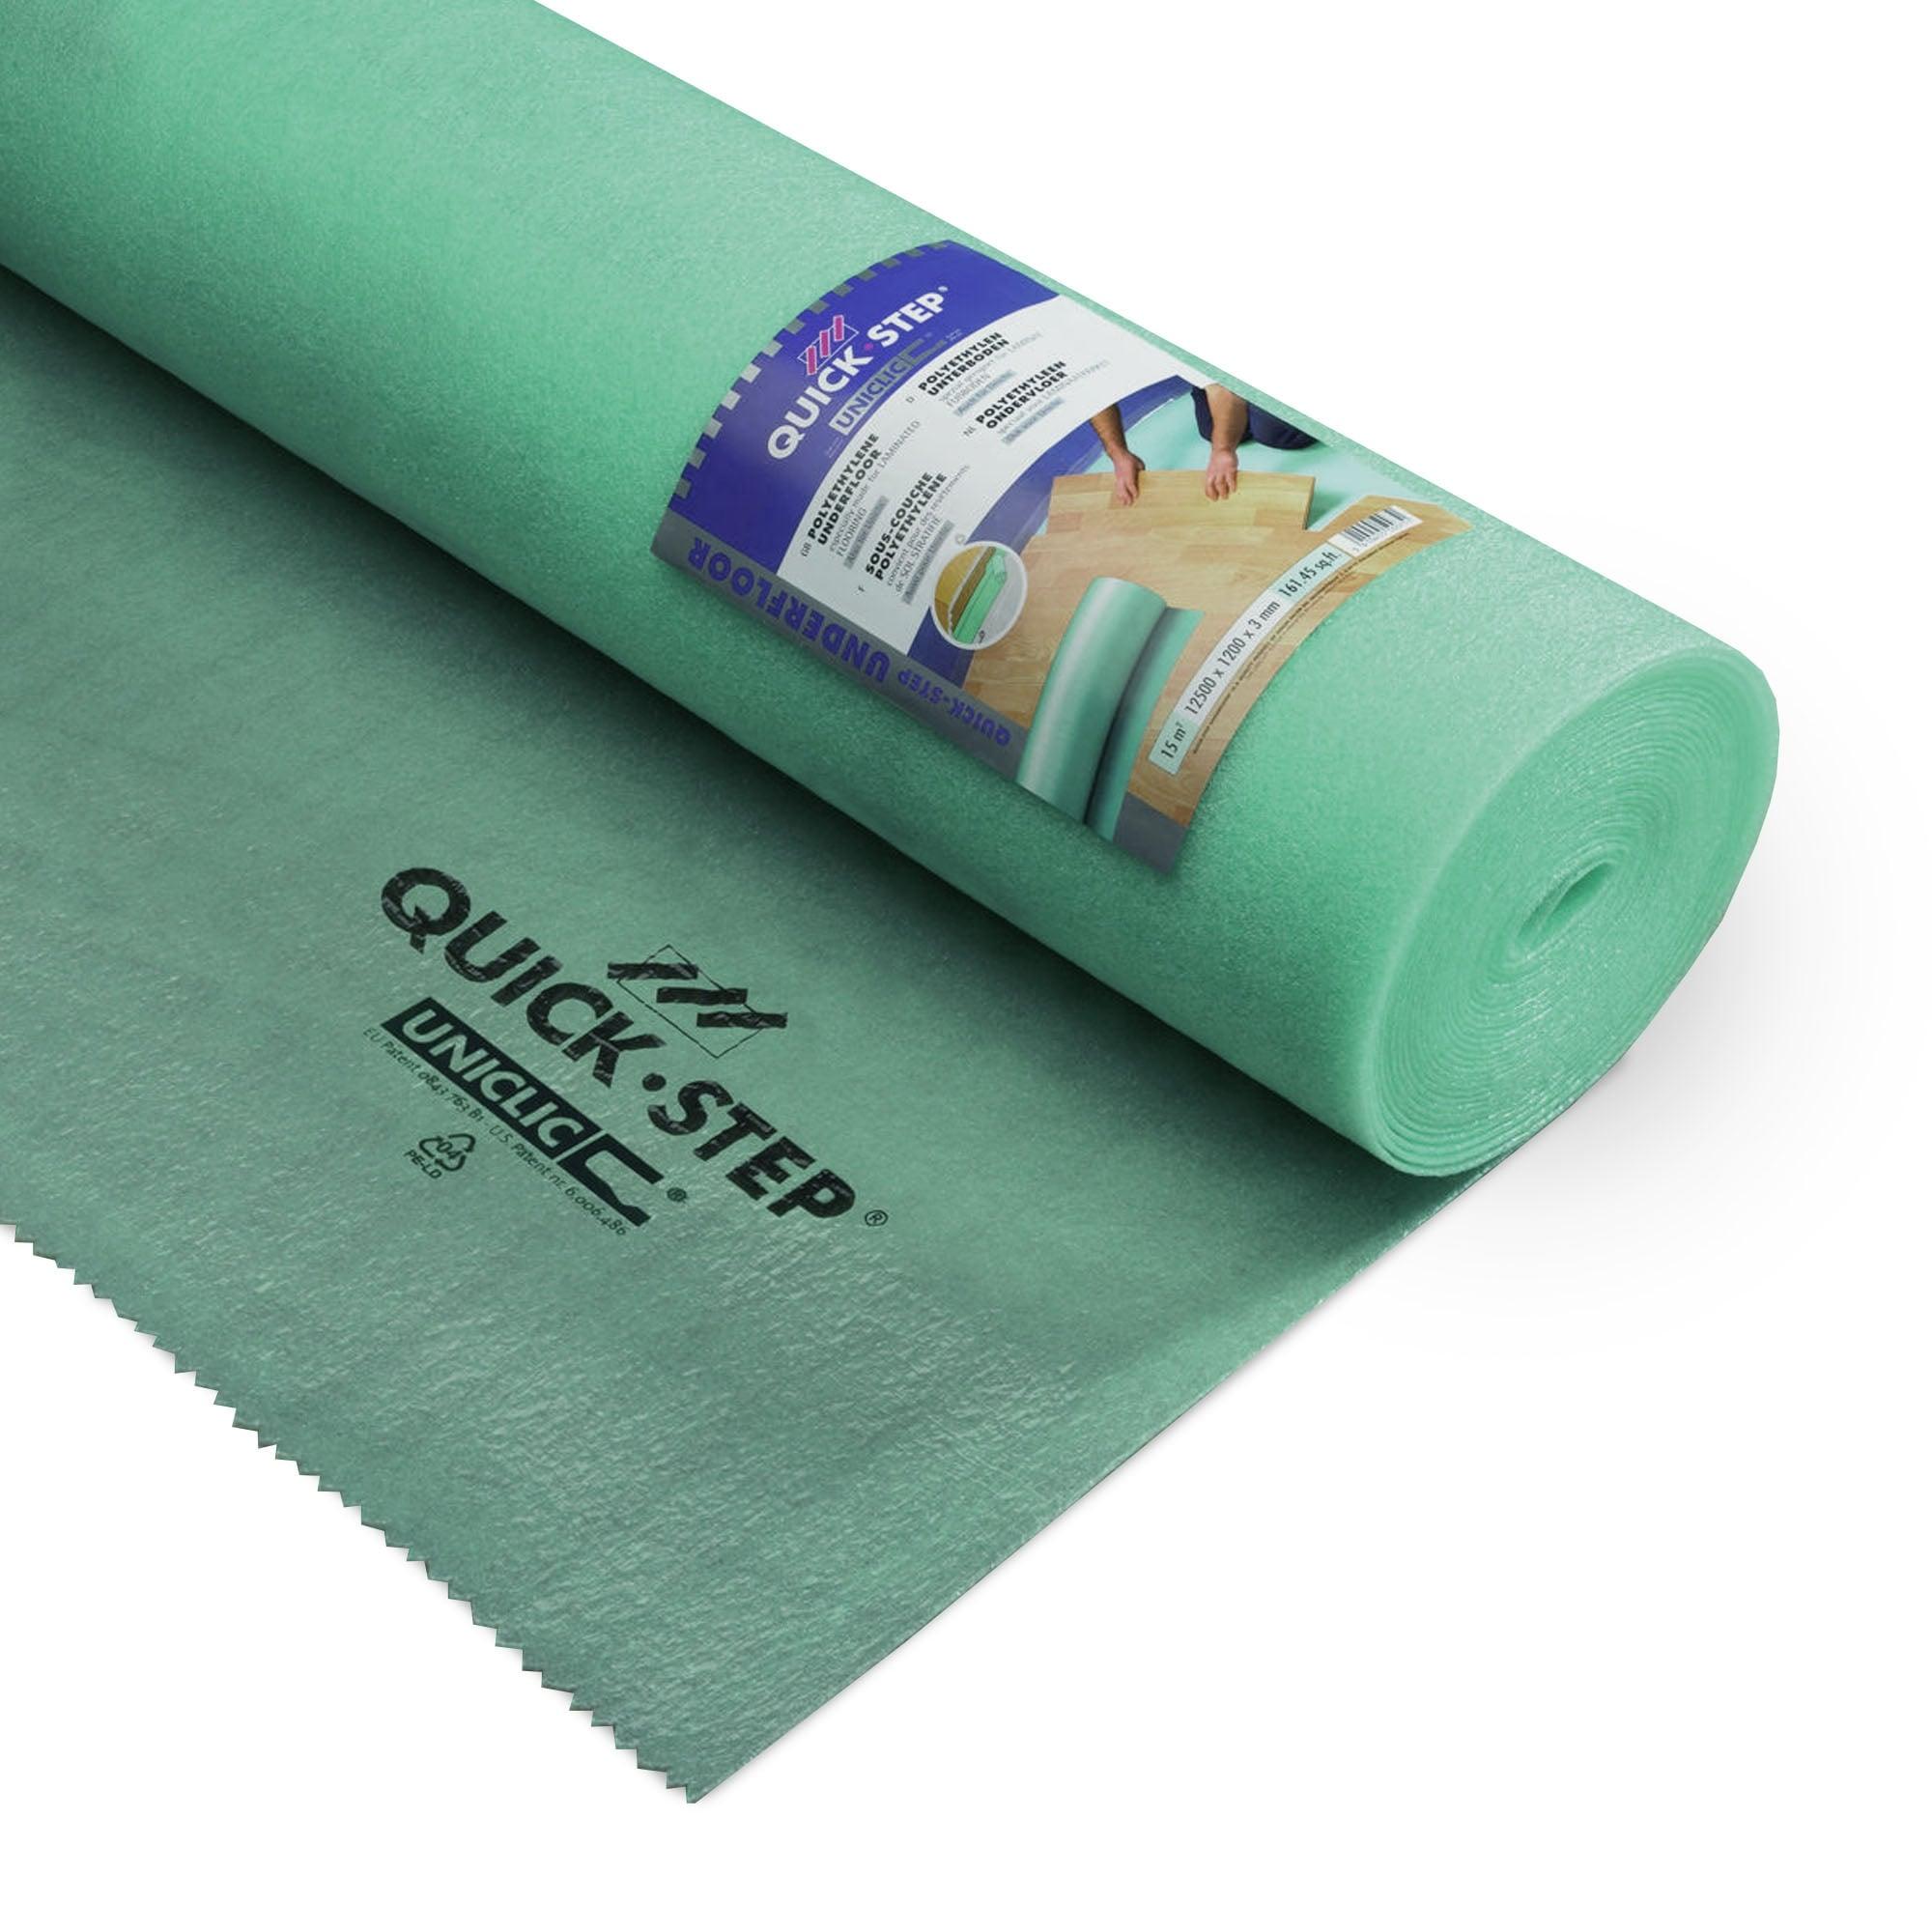 Quickstep uniclic basic 2mm foam flooring underlay for Uniclic laminate flooring